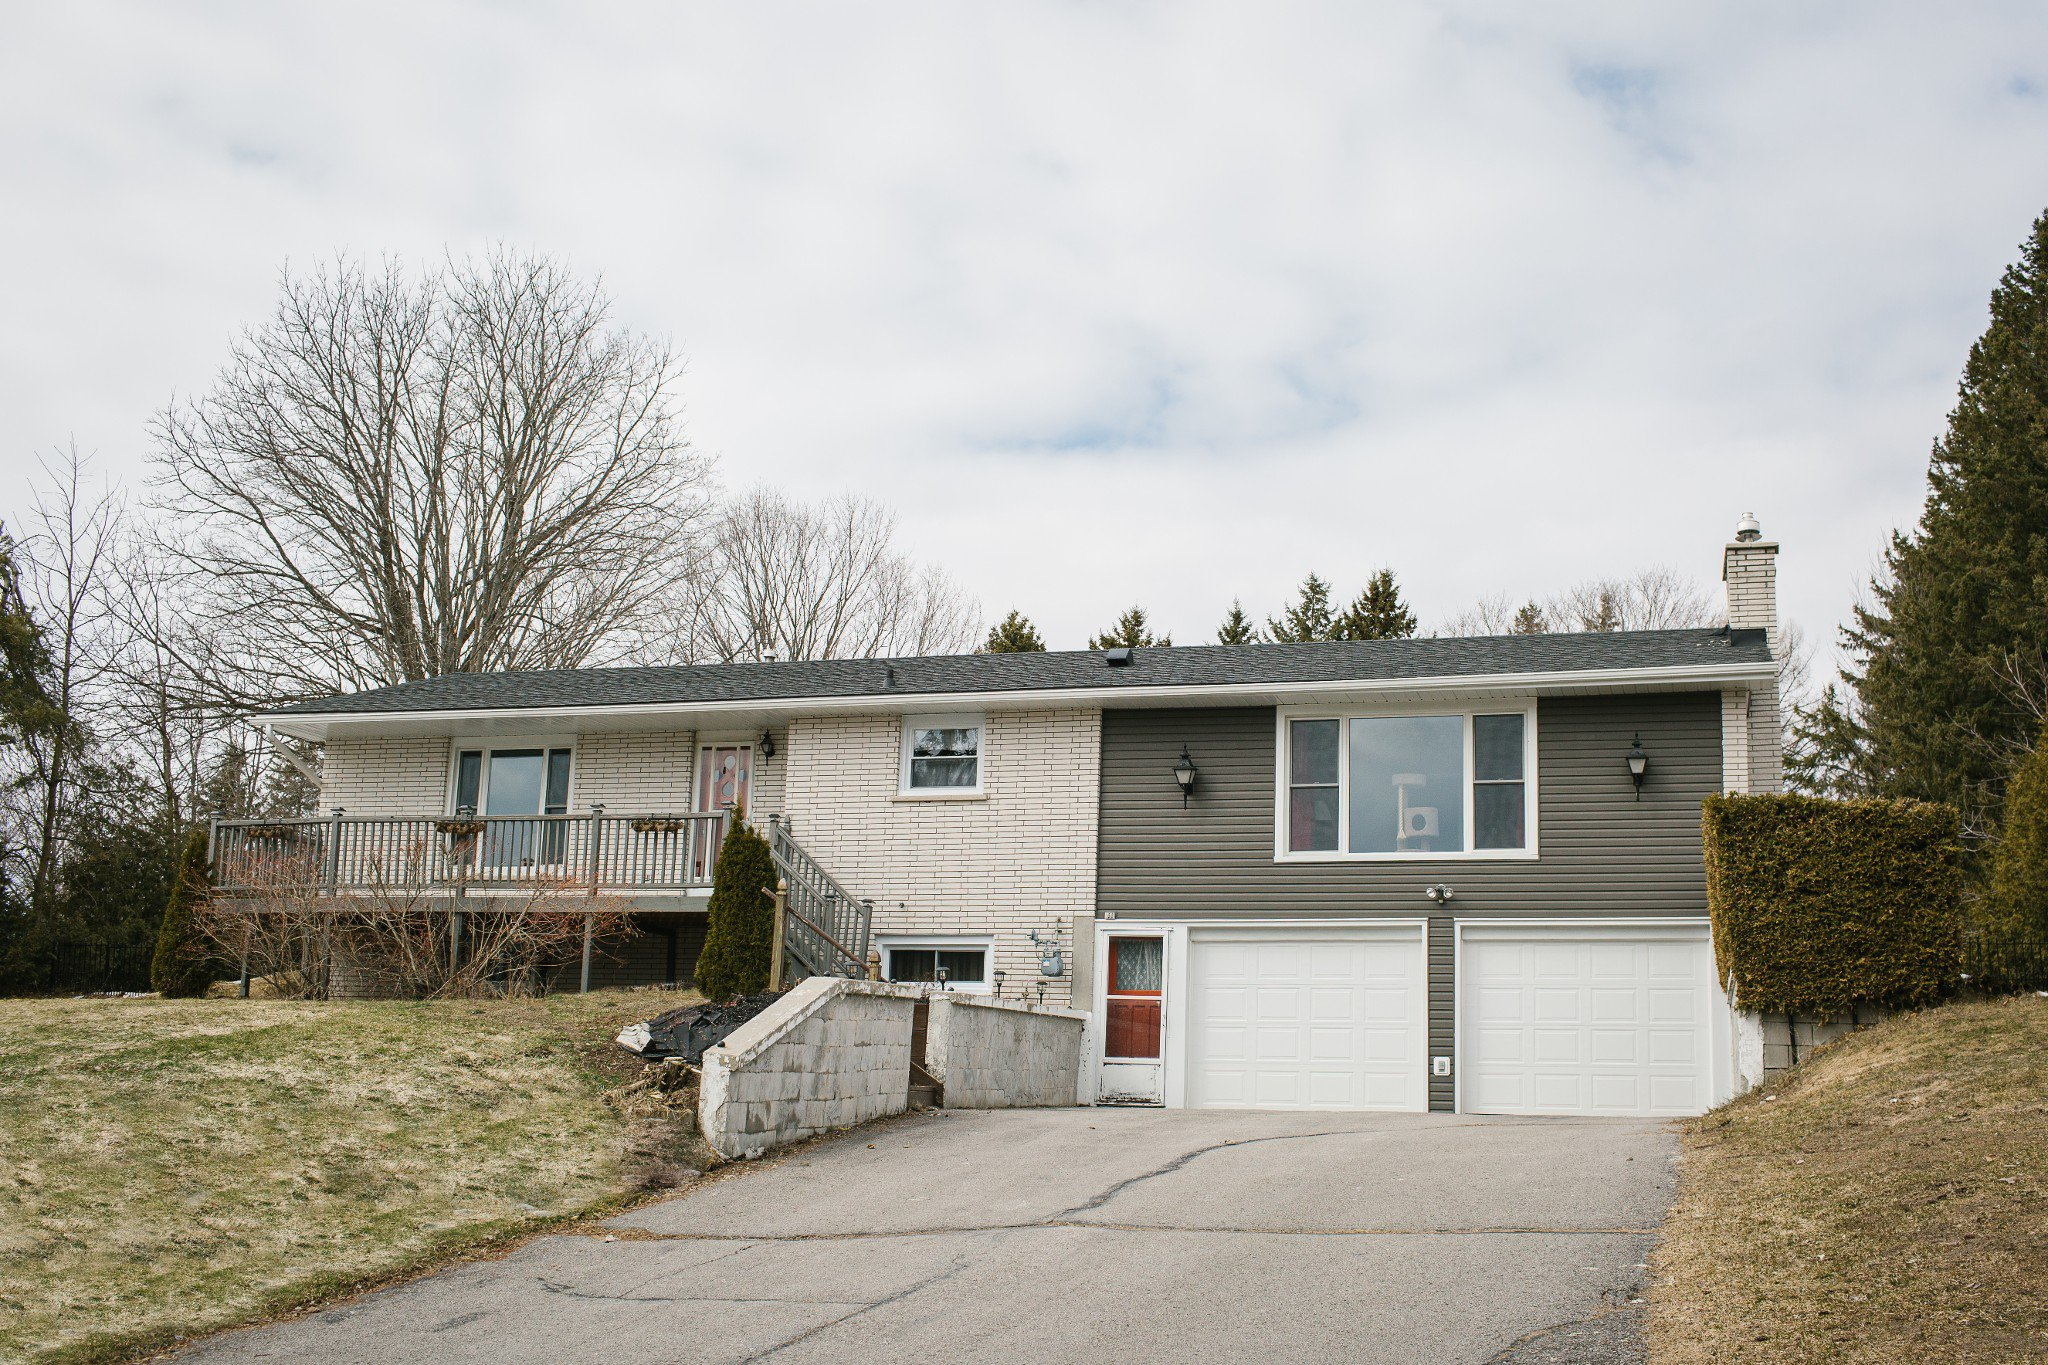 Main Photo: 122 Mill Street in Castleton: House for sale : MLS®# 245869